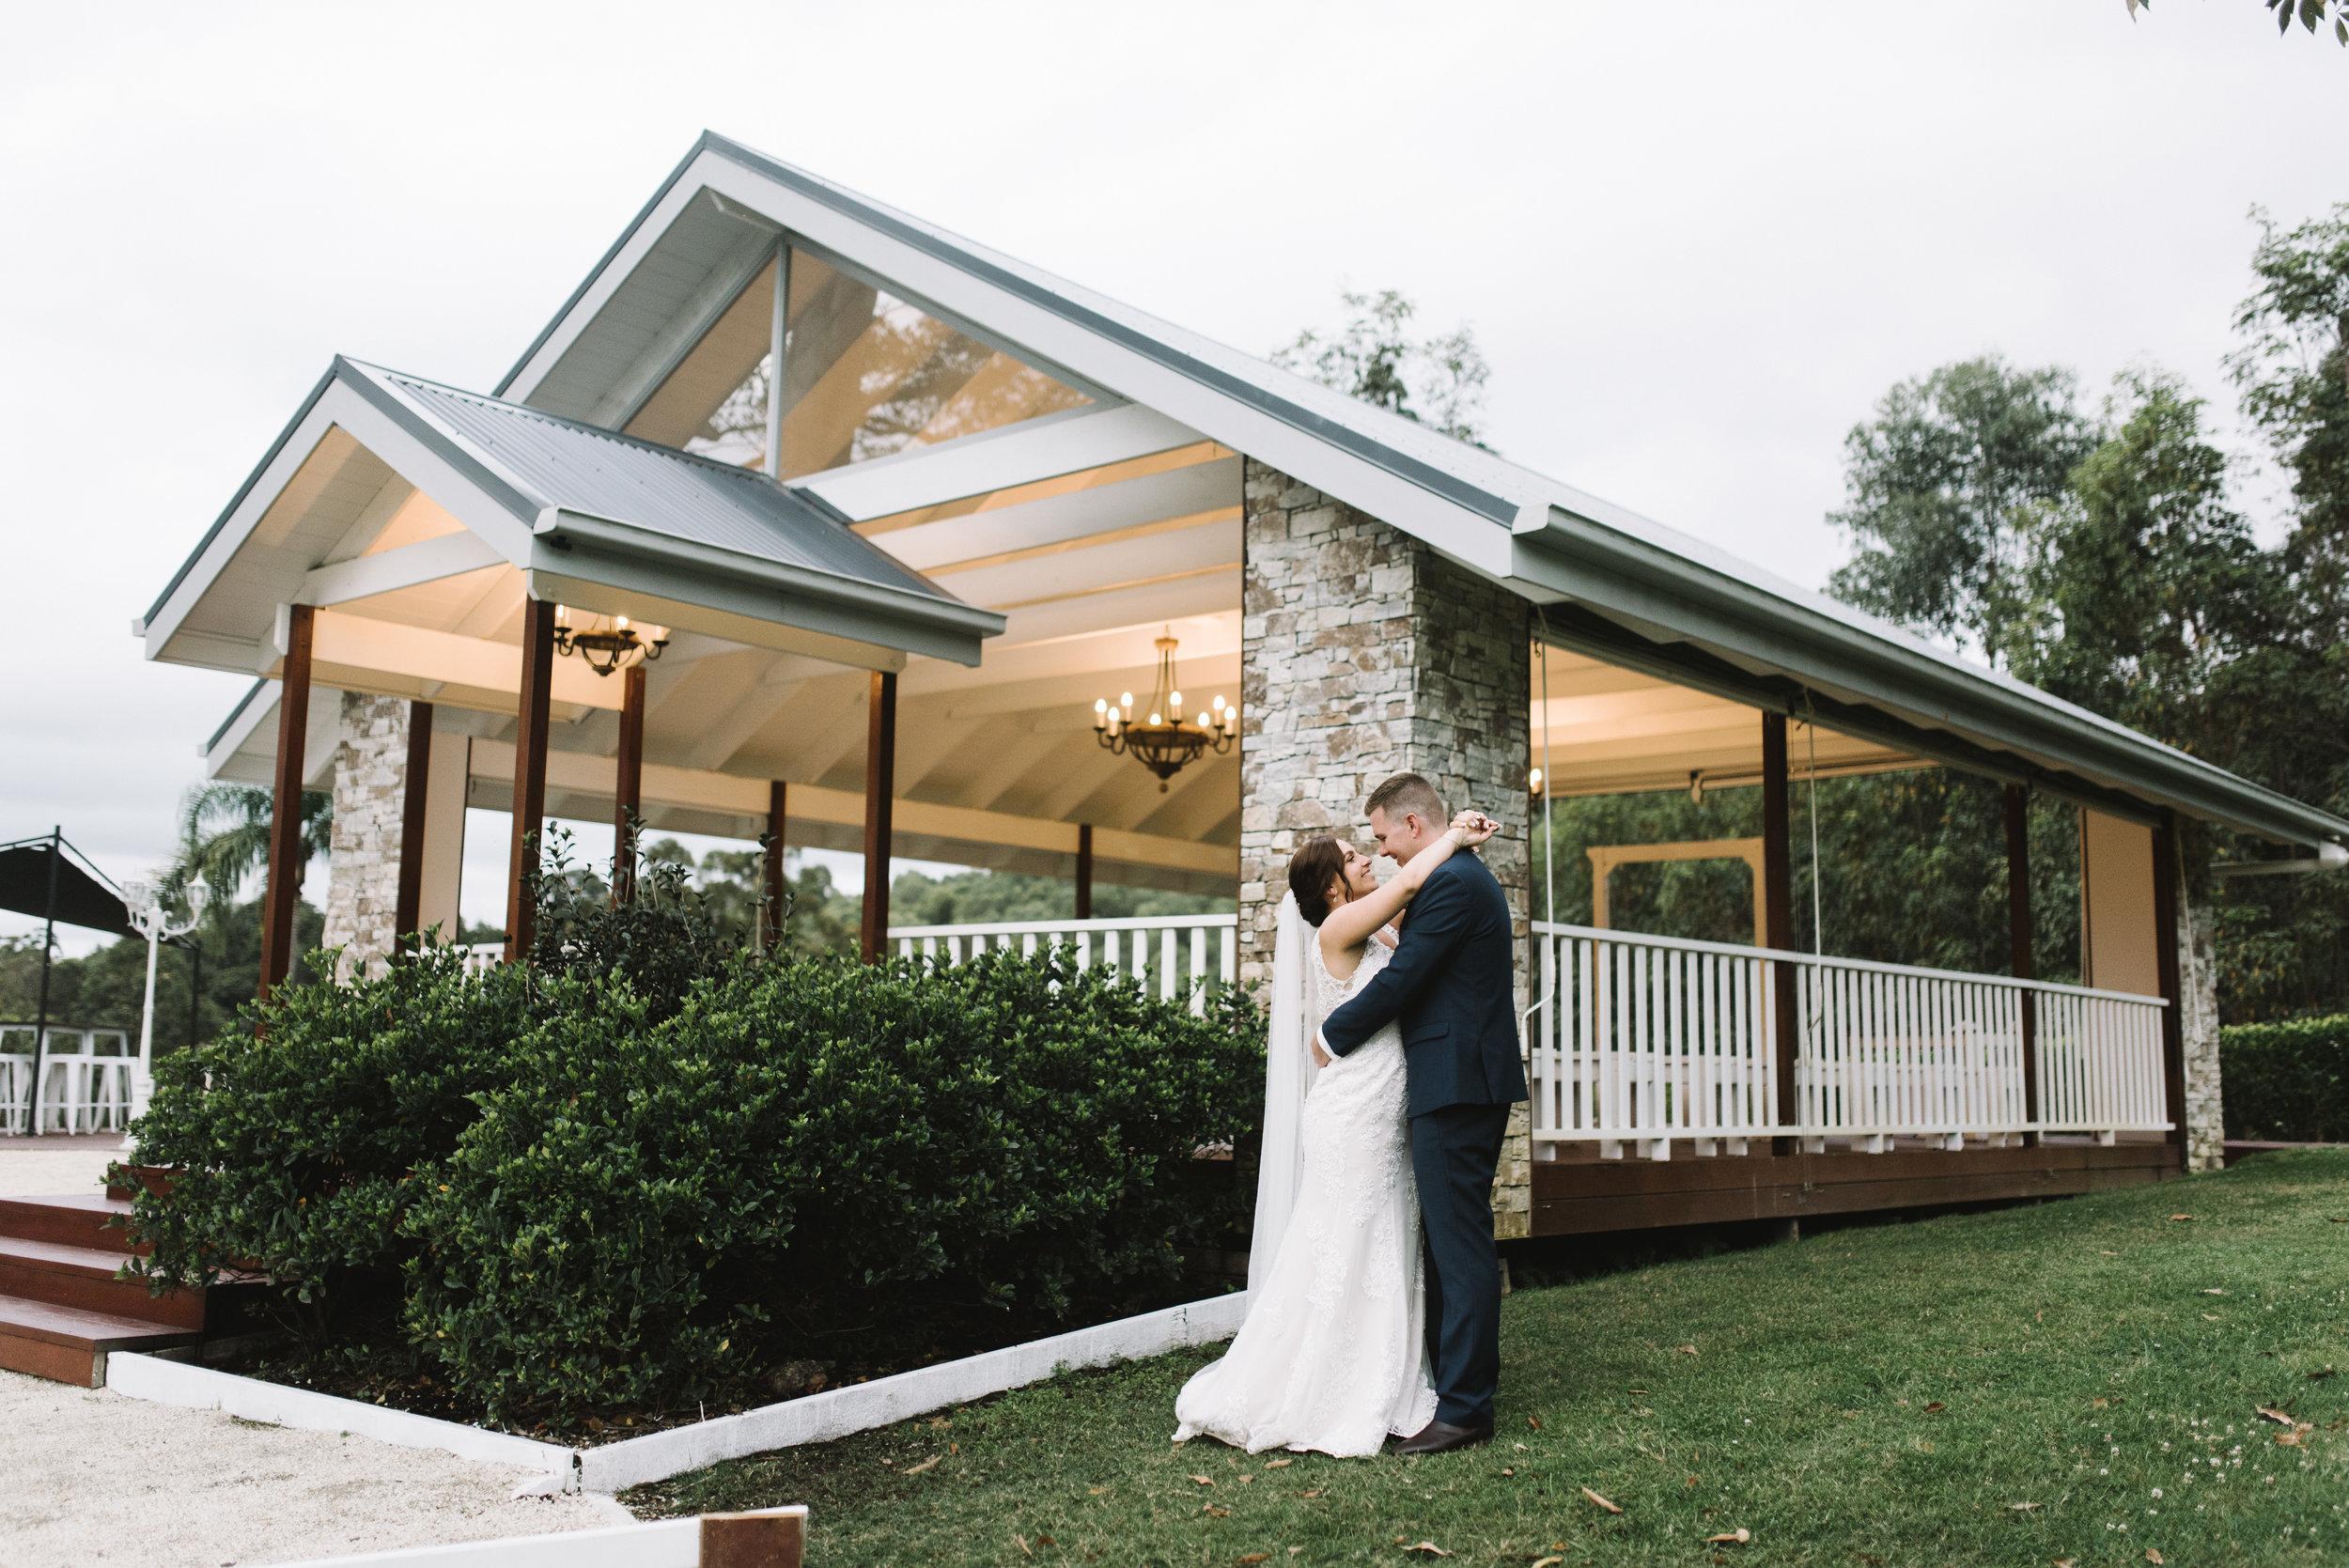 LAURENOLIVIA-austinvilla-estate-wedding-70.jpg